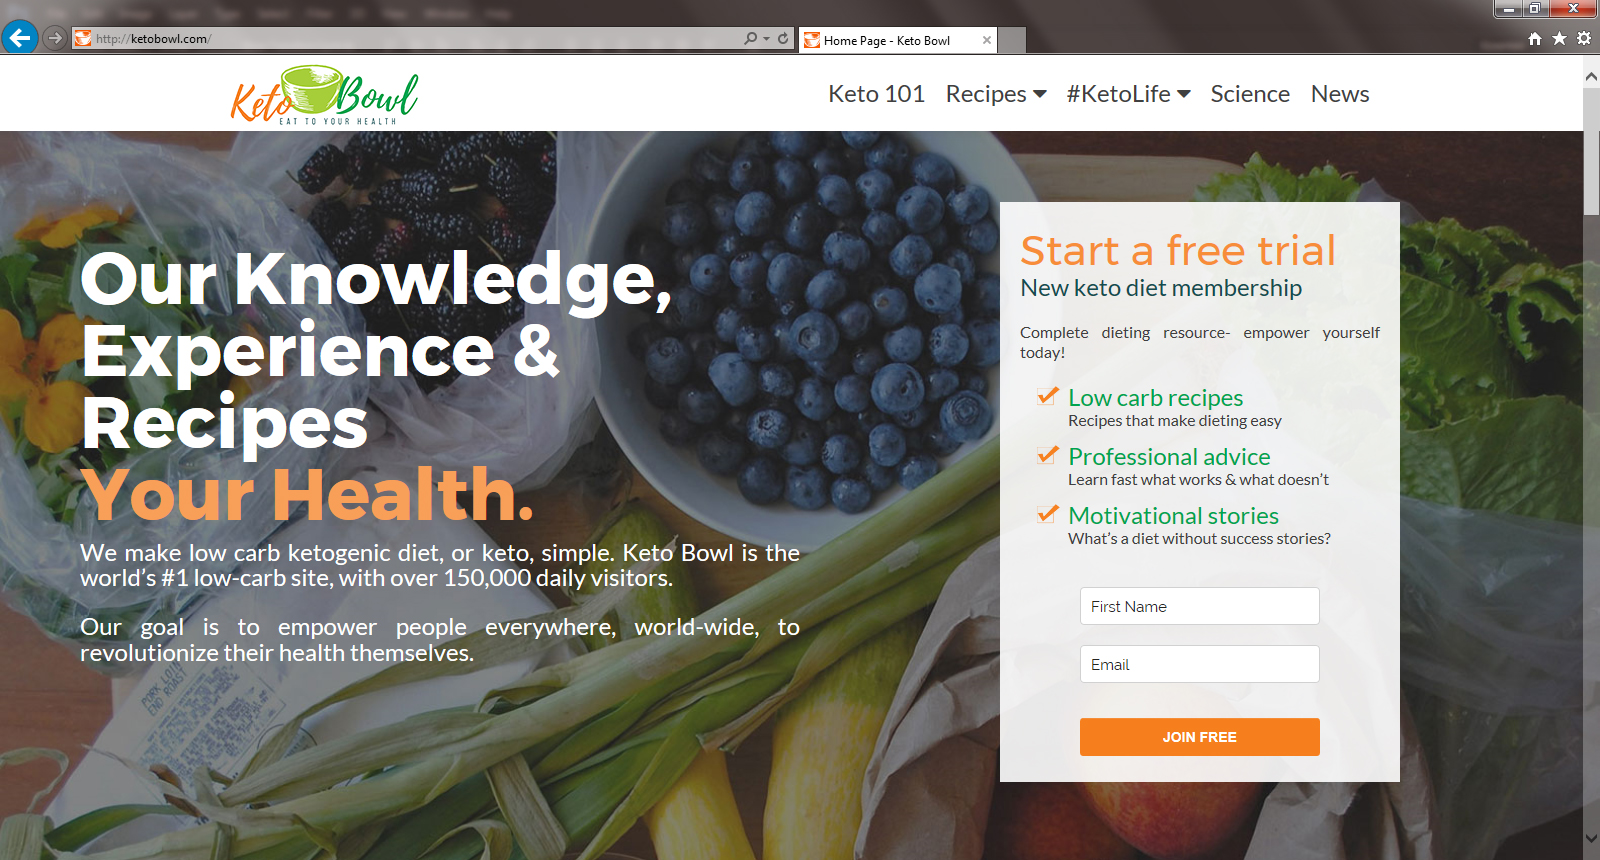 website-design-services-oc9.jpg